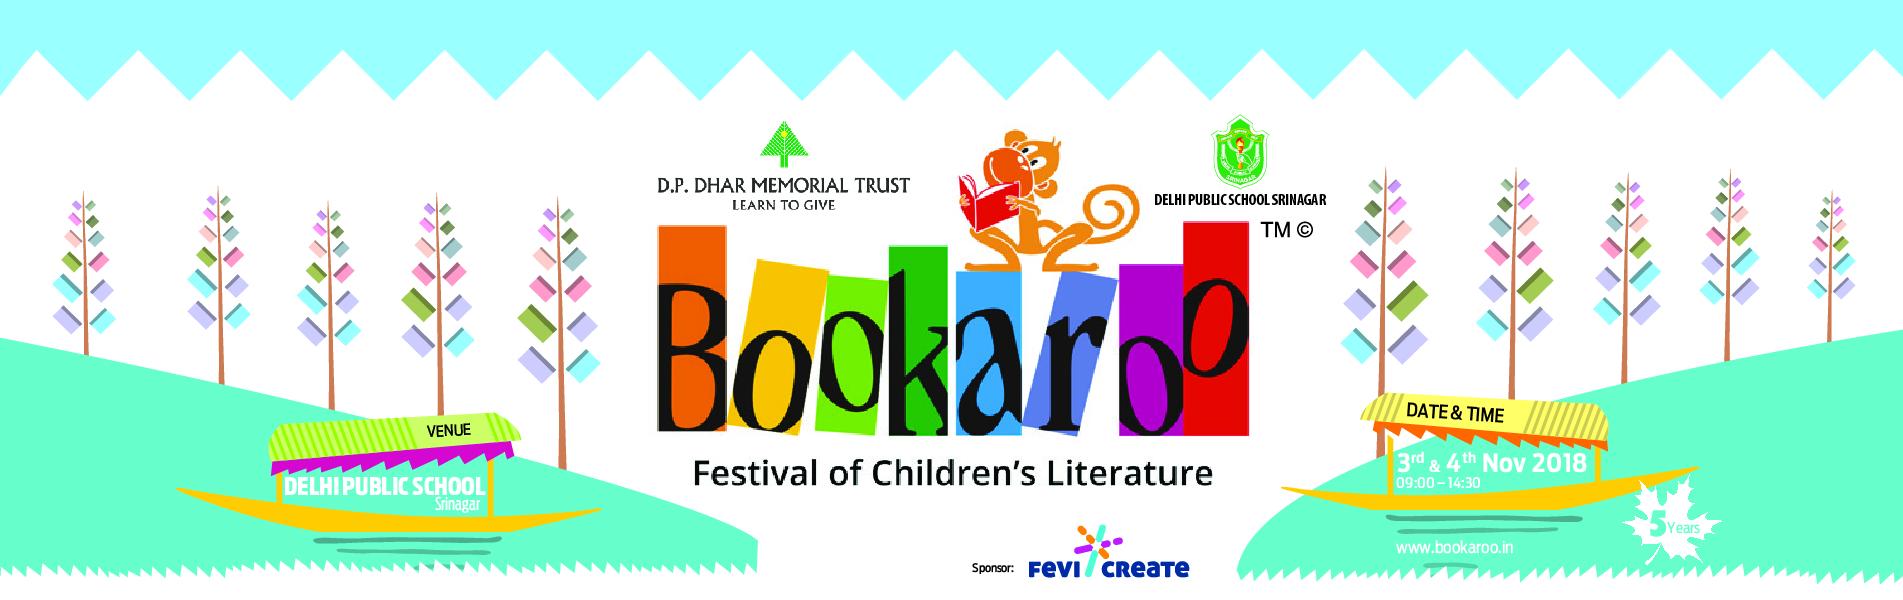 DPS Srinagar brings Bookaroo Children's Literature Festival to Srinagar for the 5th year